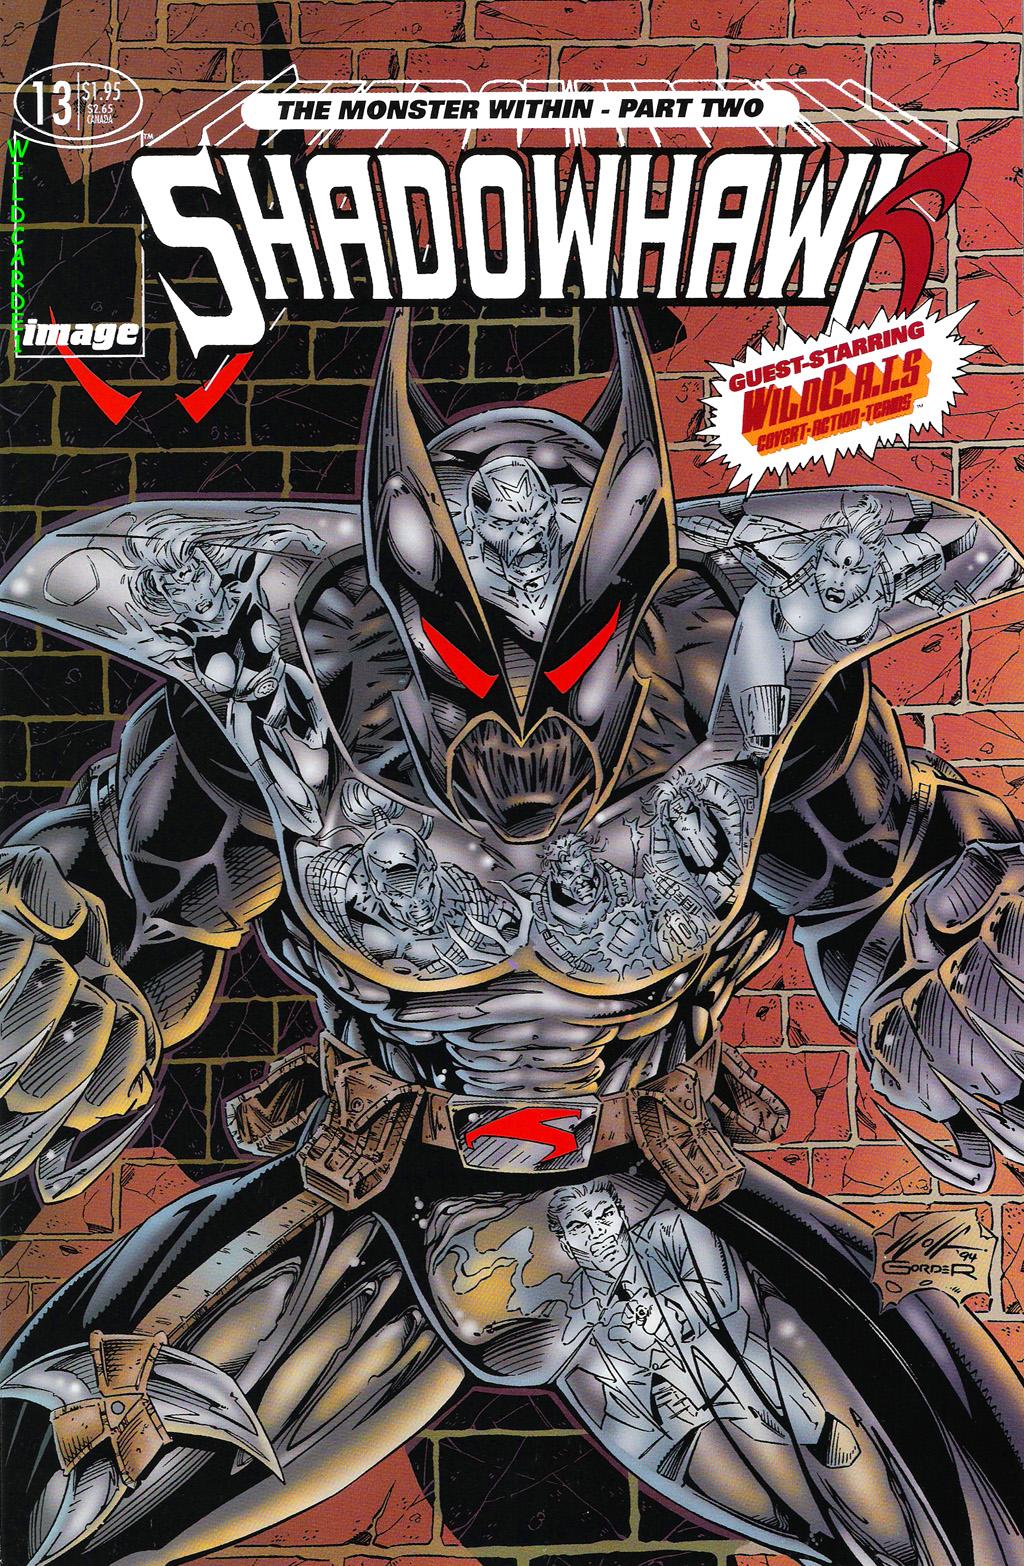 Read online ShadowHawk comic -  Issue #13 - 1